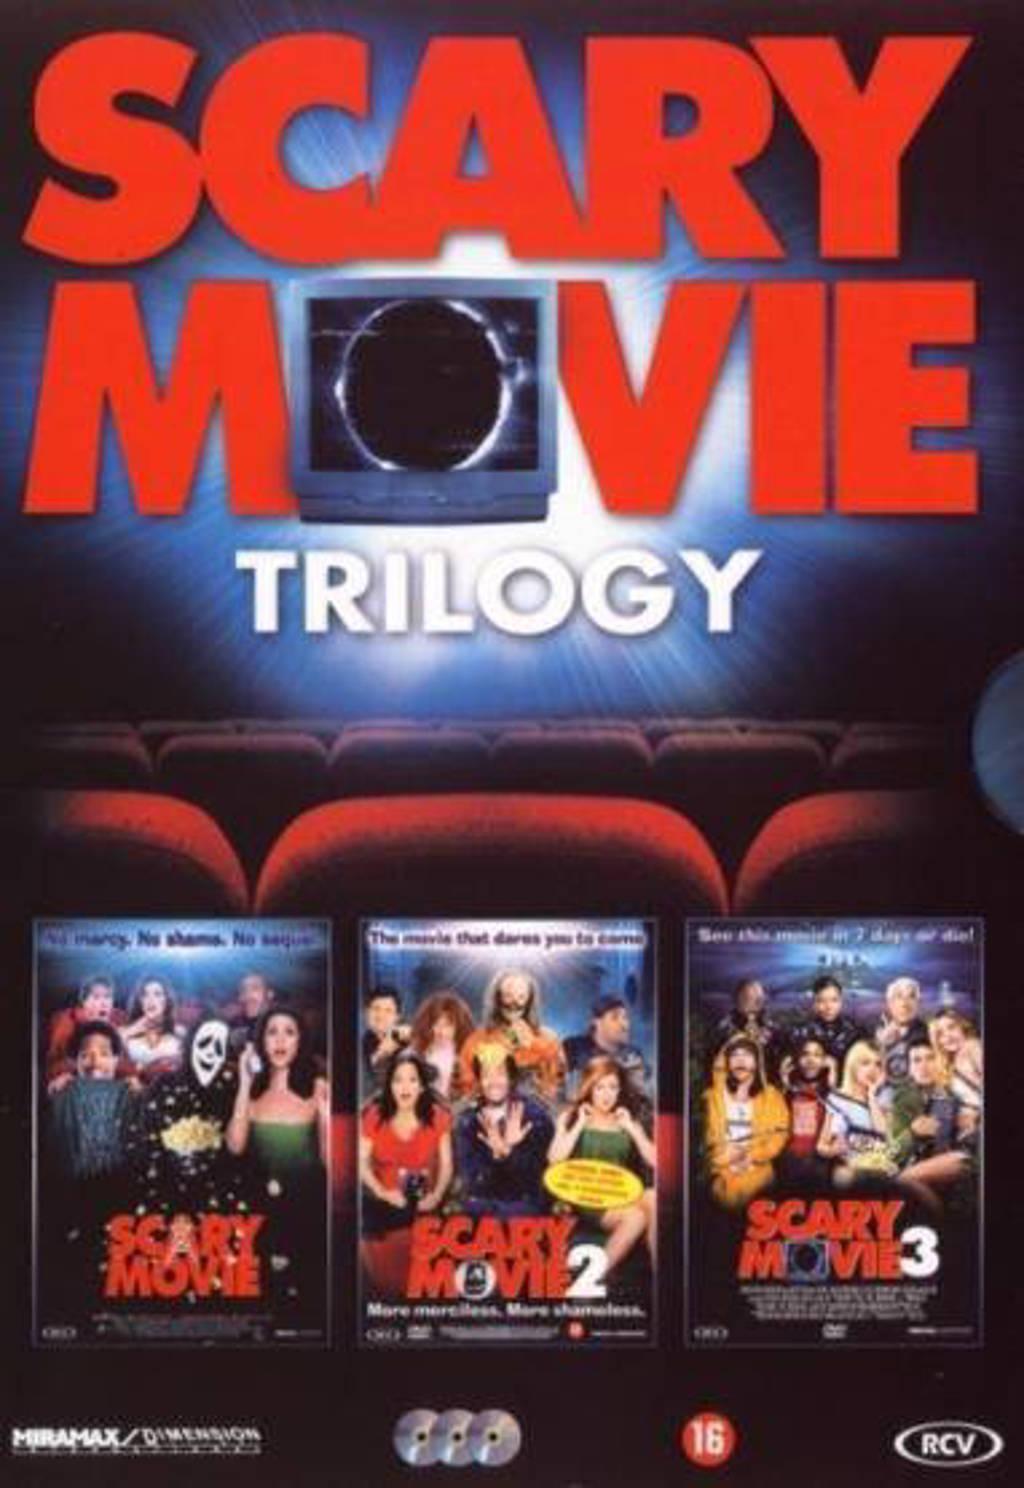 Scary movie trilogy  (DVD)